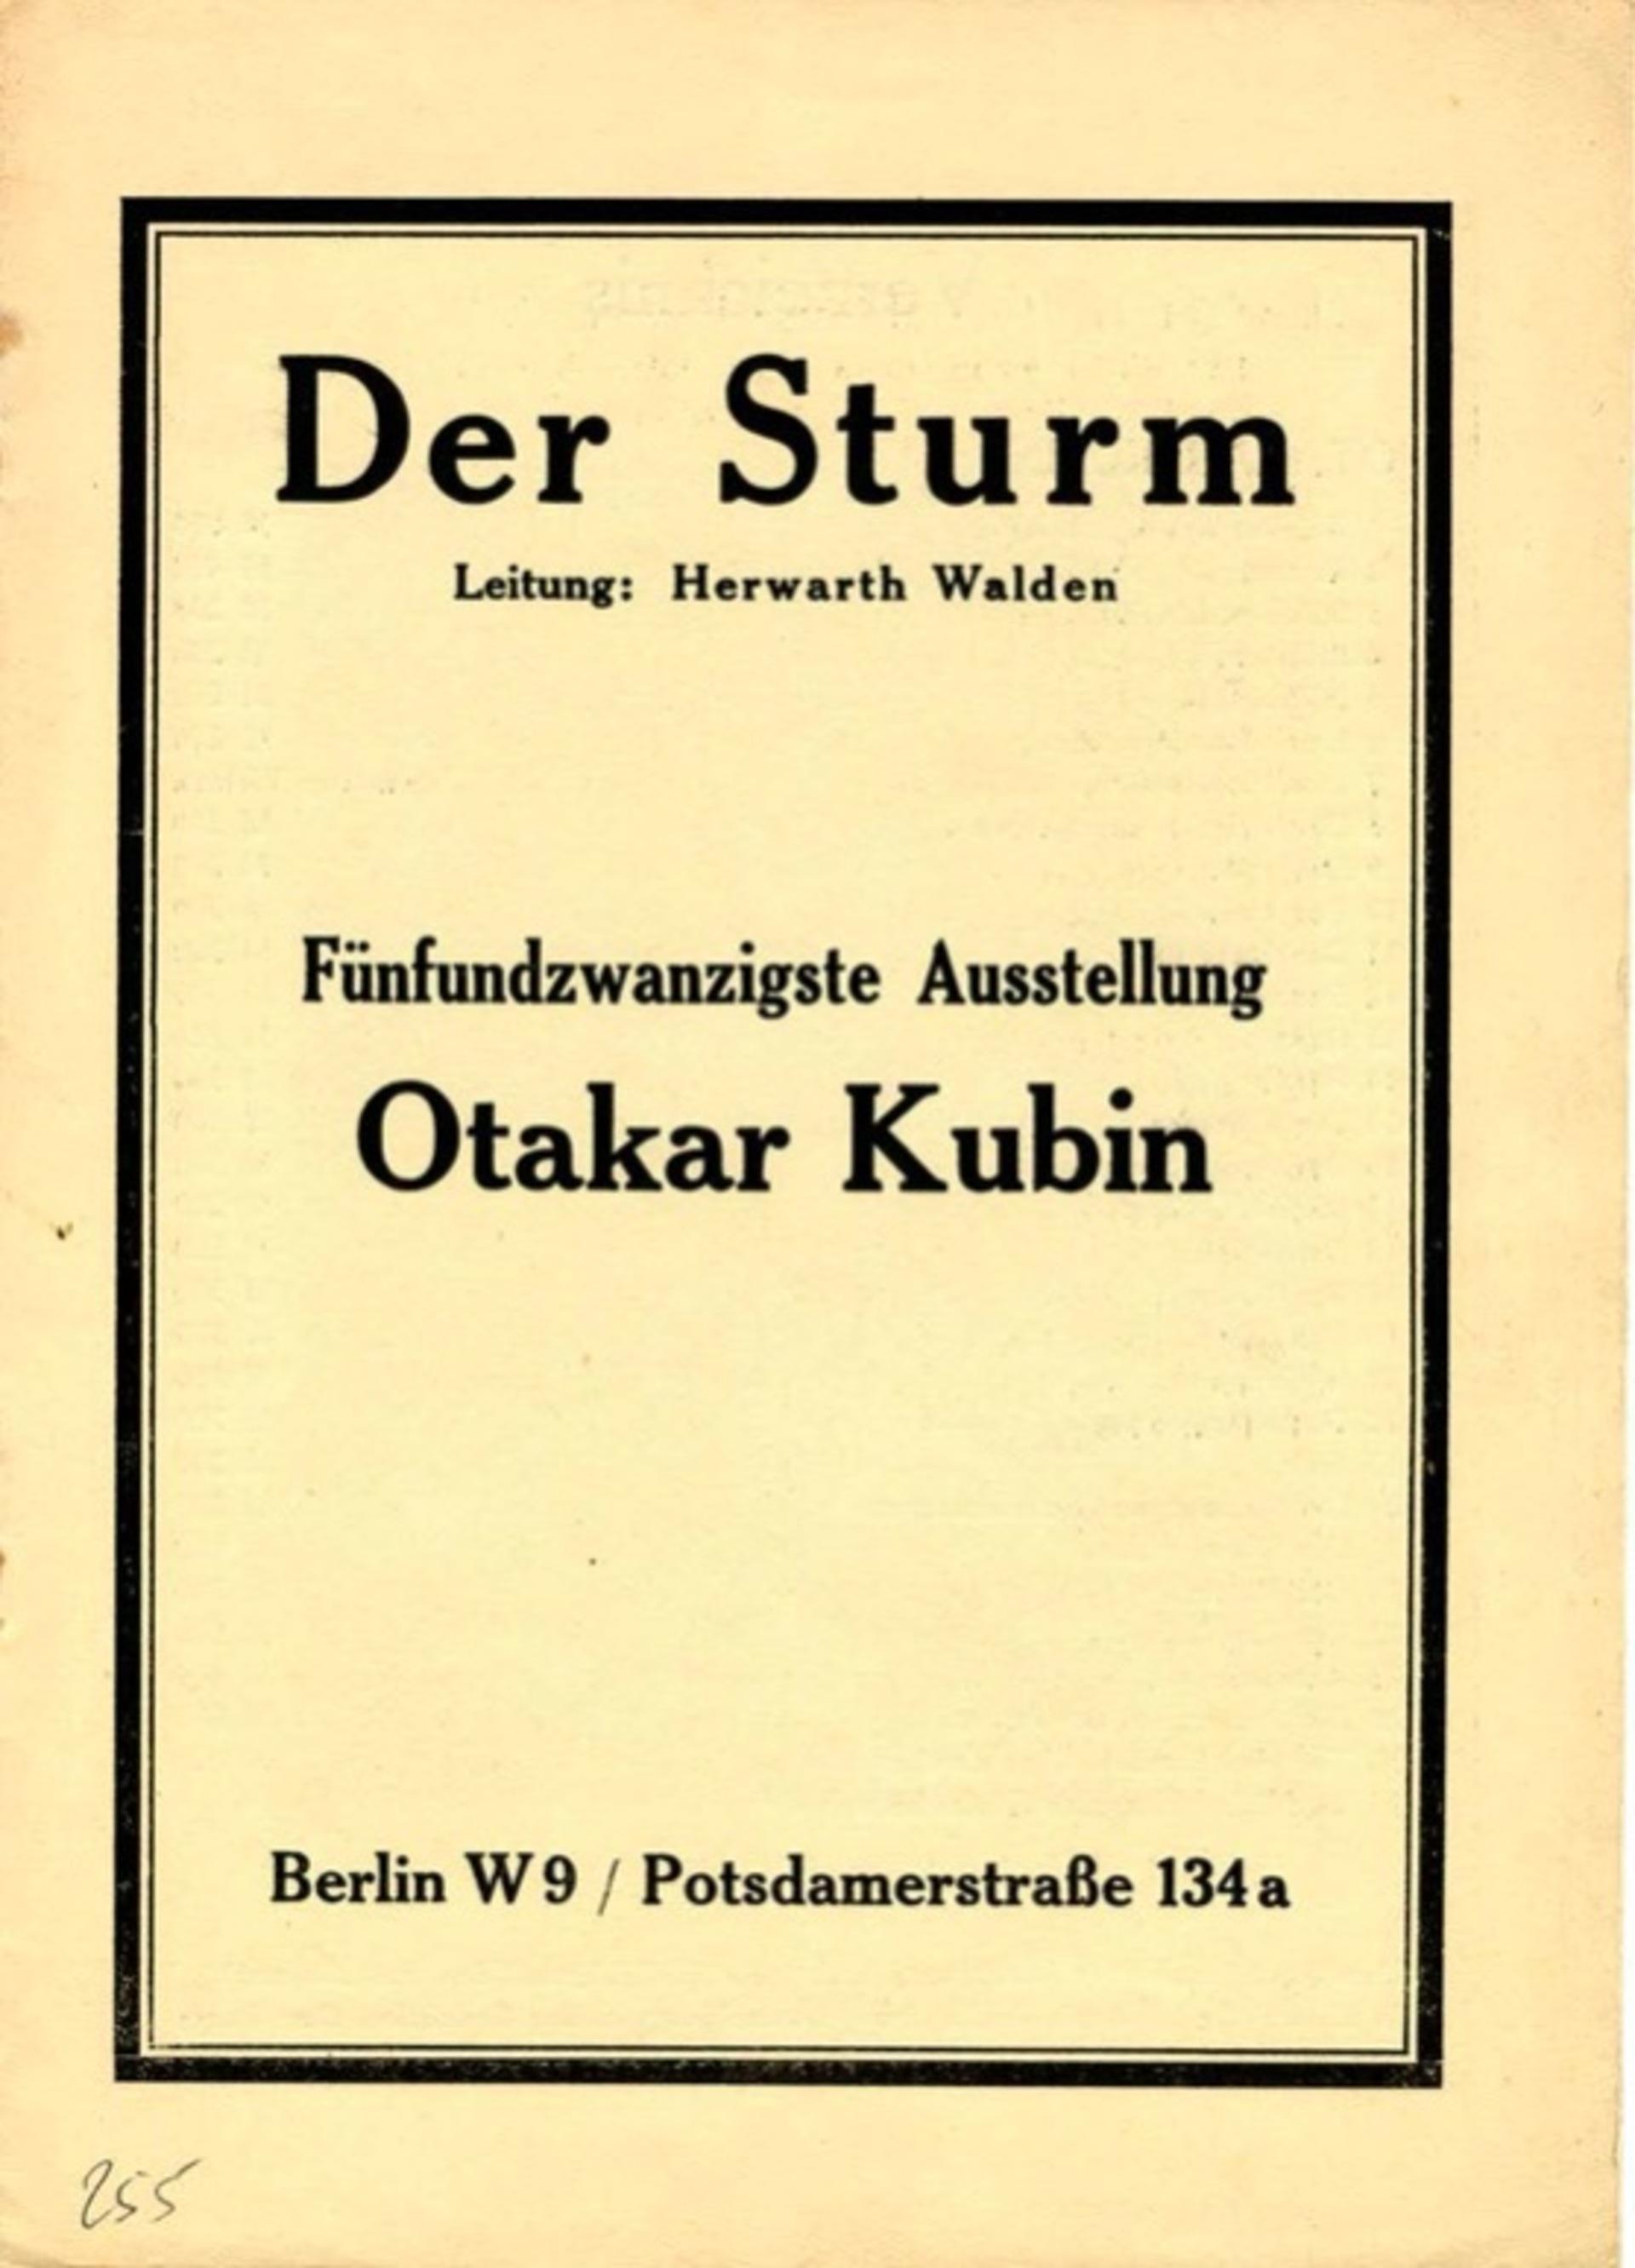 Katalog výstavy Otakara Kubína v galerii Der Sturm v Berlíně, duben 1914, XXV. výstava